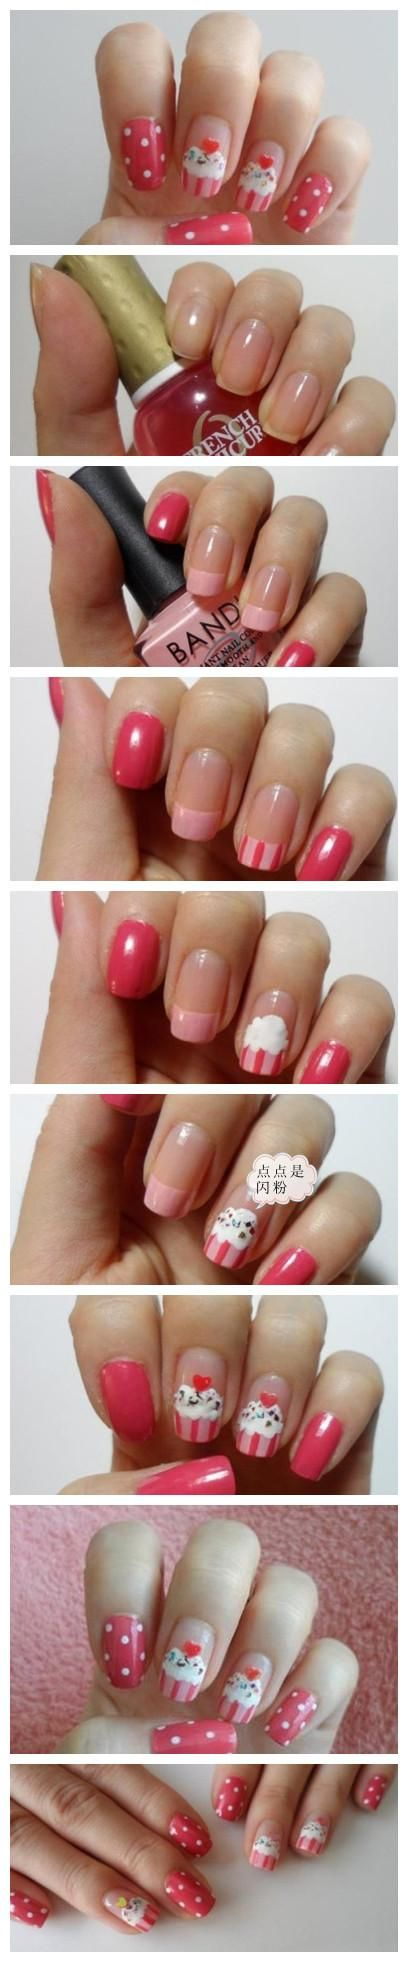 DIY - Cupcake Nail Art ♥